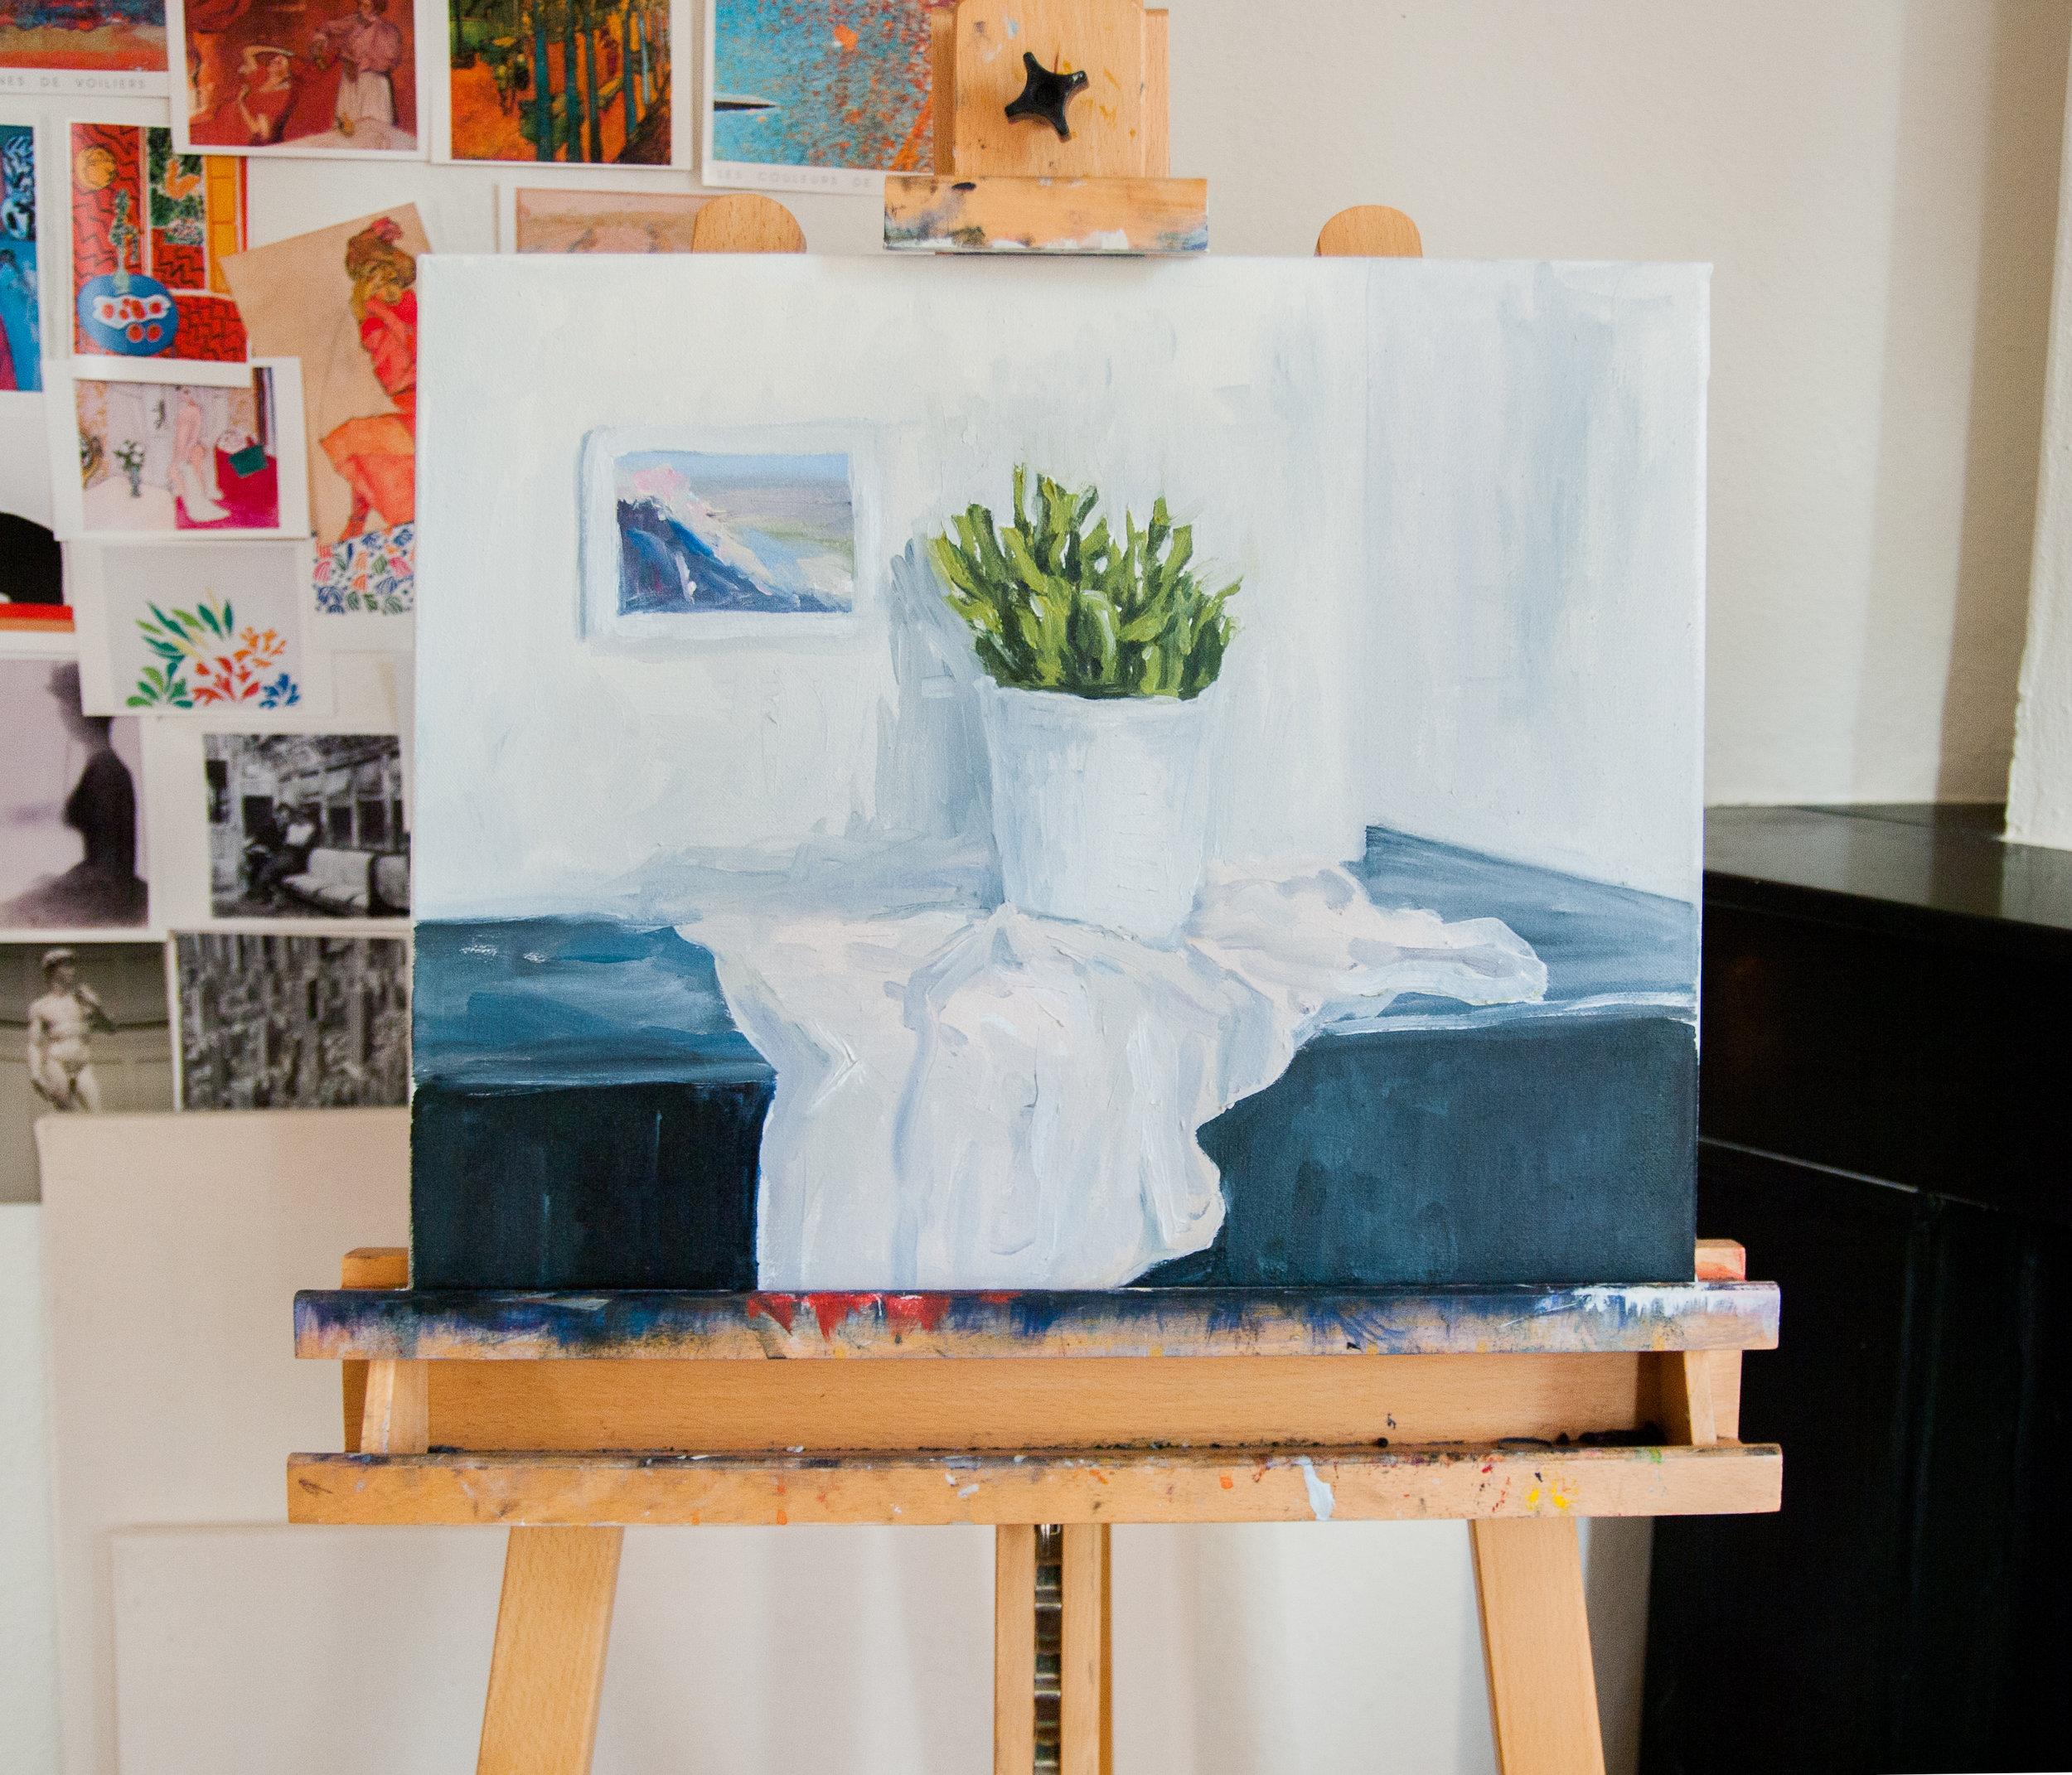 Still Life Day 350. 50x40cm. Oil on canvas. 2016.